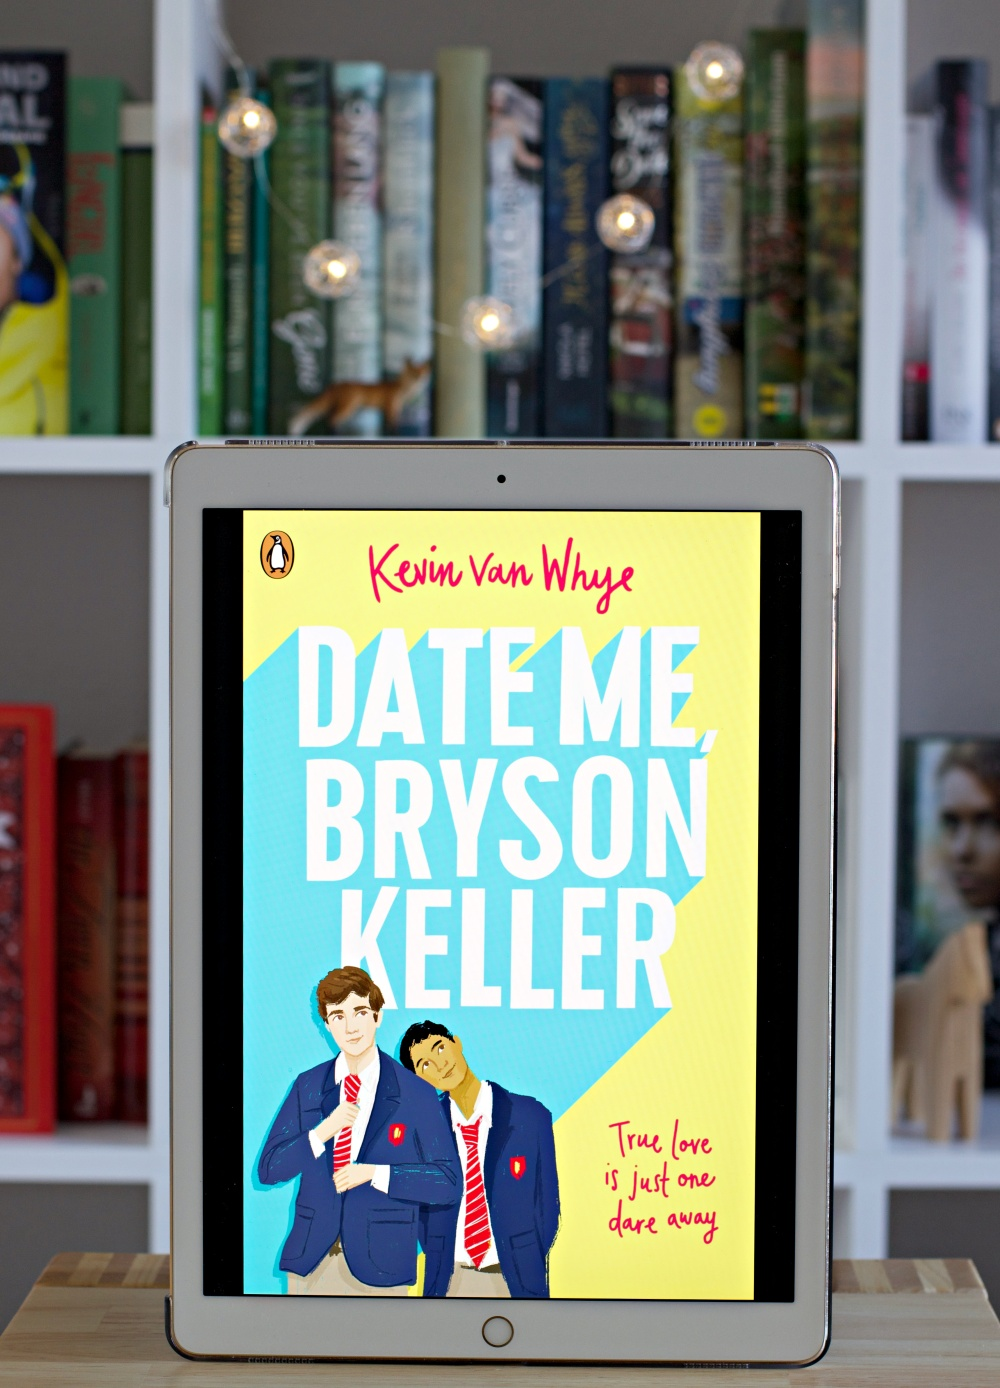 Lesemonat Februar 2021 Date Me Bryson Keller von Kevin van Whye